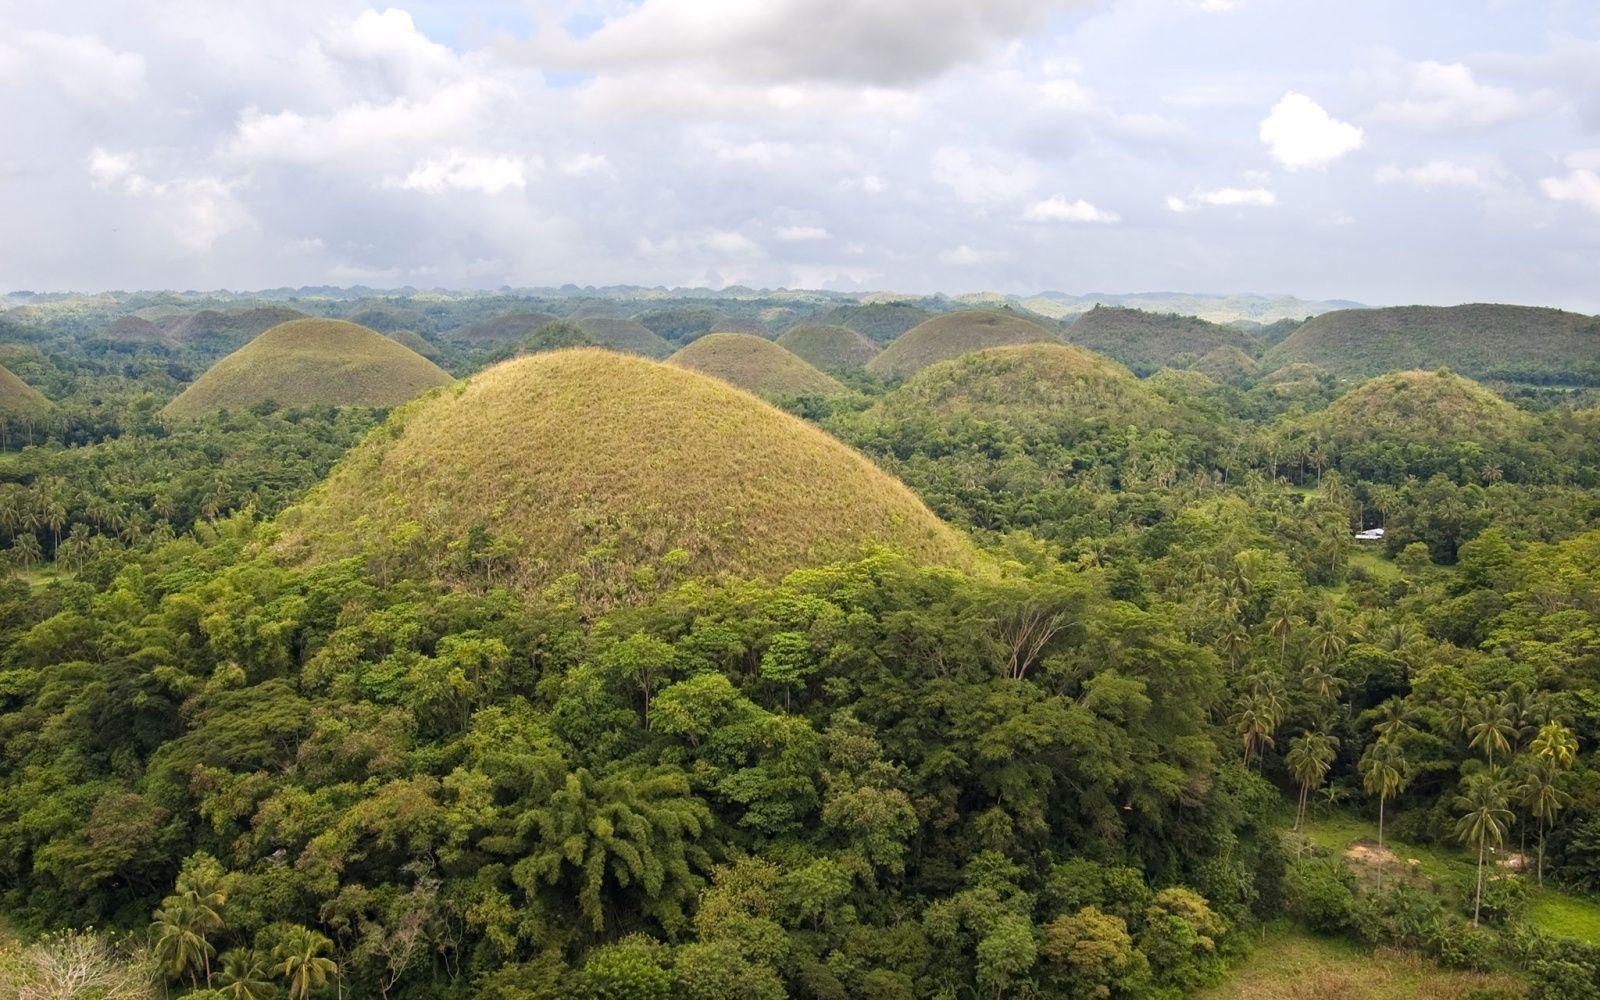 Chocolate Hills, Philippines - World's Strangest Natural Wonders | Travel + Leisure